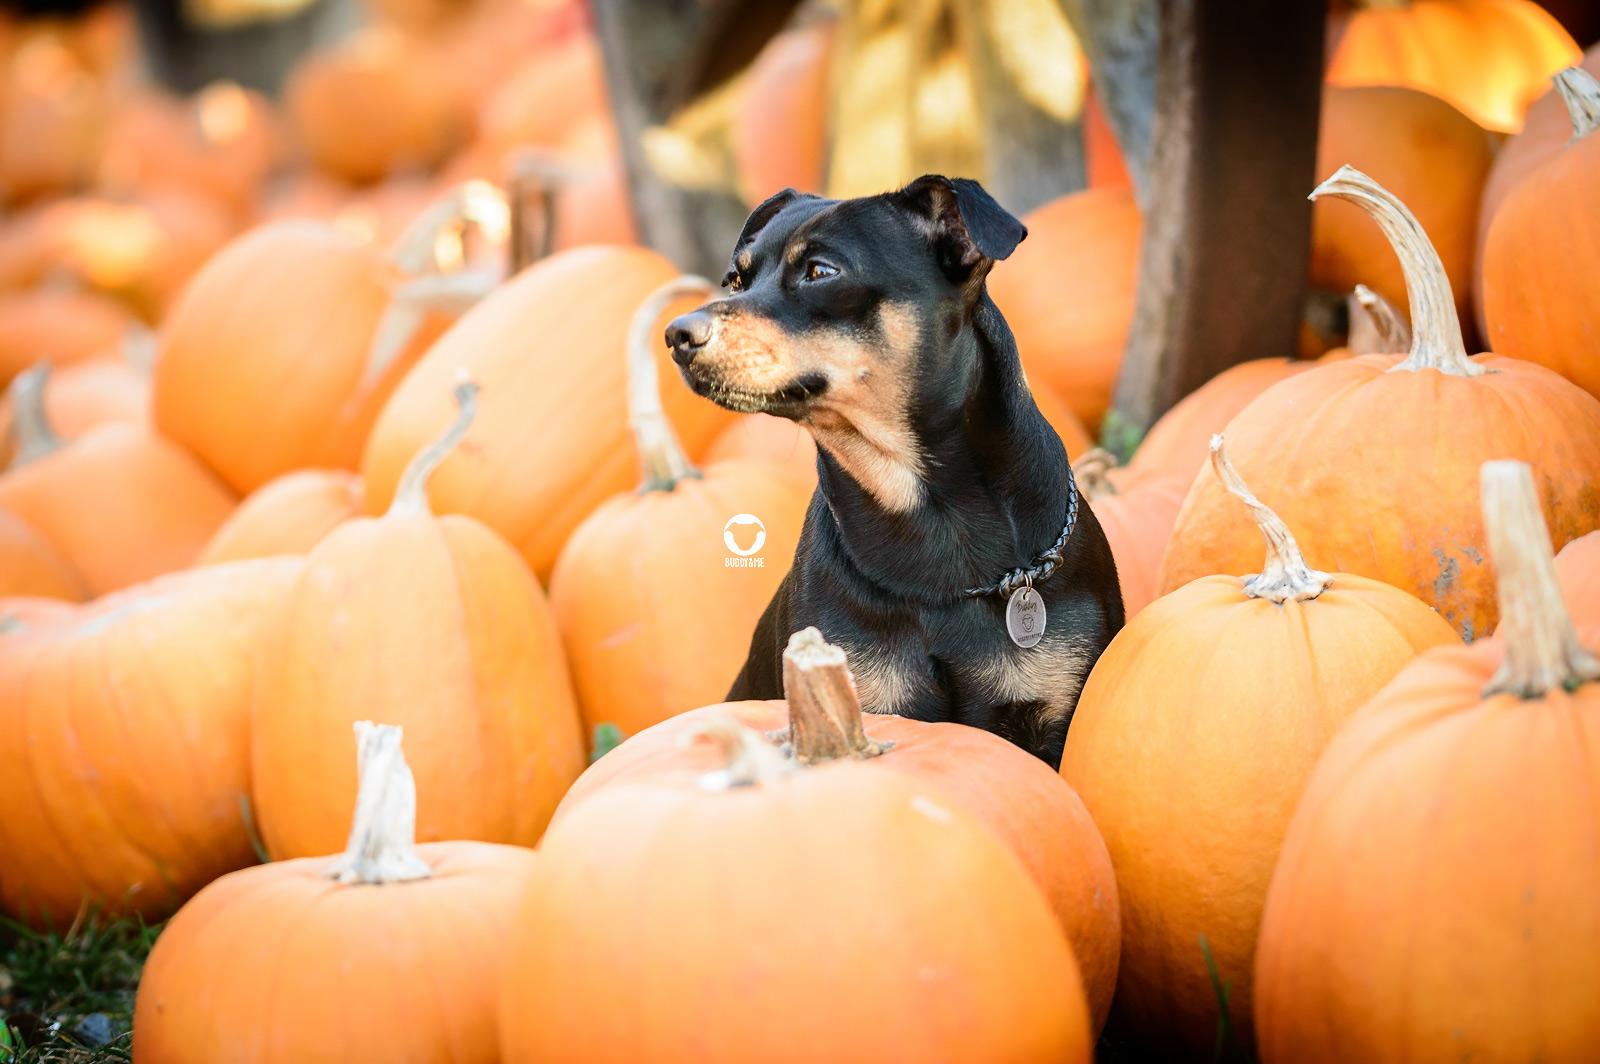 Pinscher Buddy, Buddy and Me, Hundeblog, Dogblog, Halloween, Kürbisse, Kürbis, Hundefotografie, Nikon D3200, Herbst